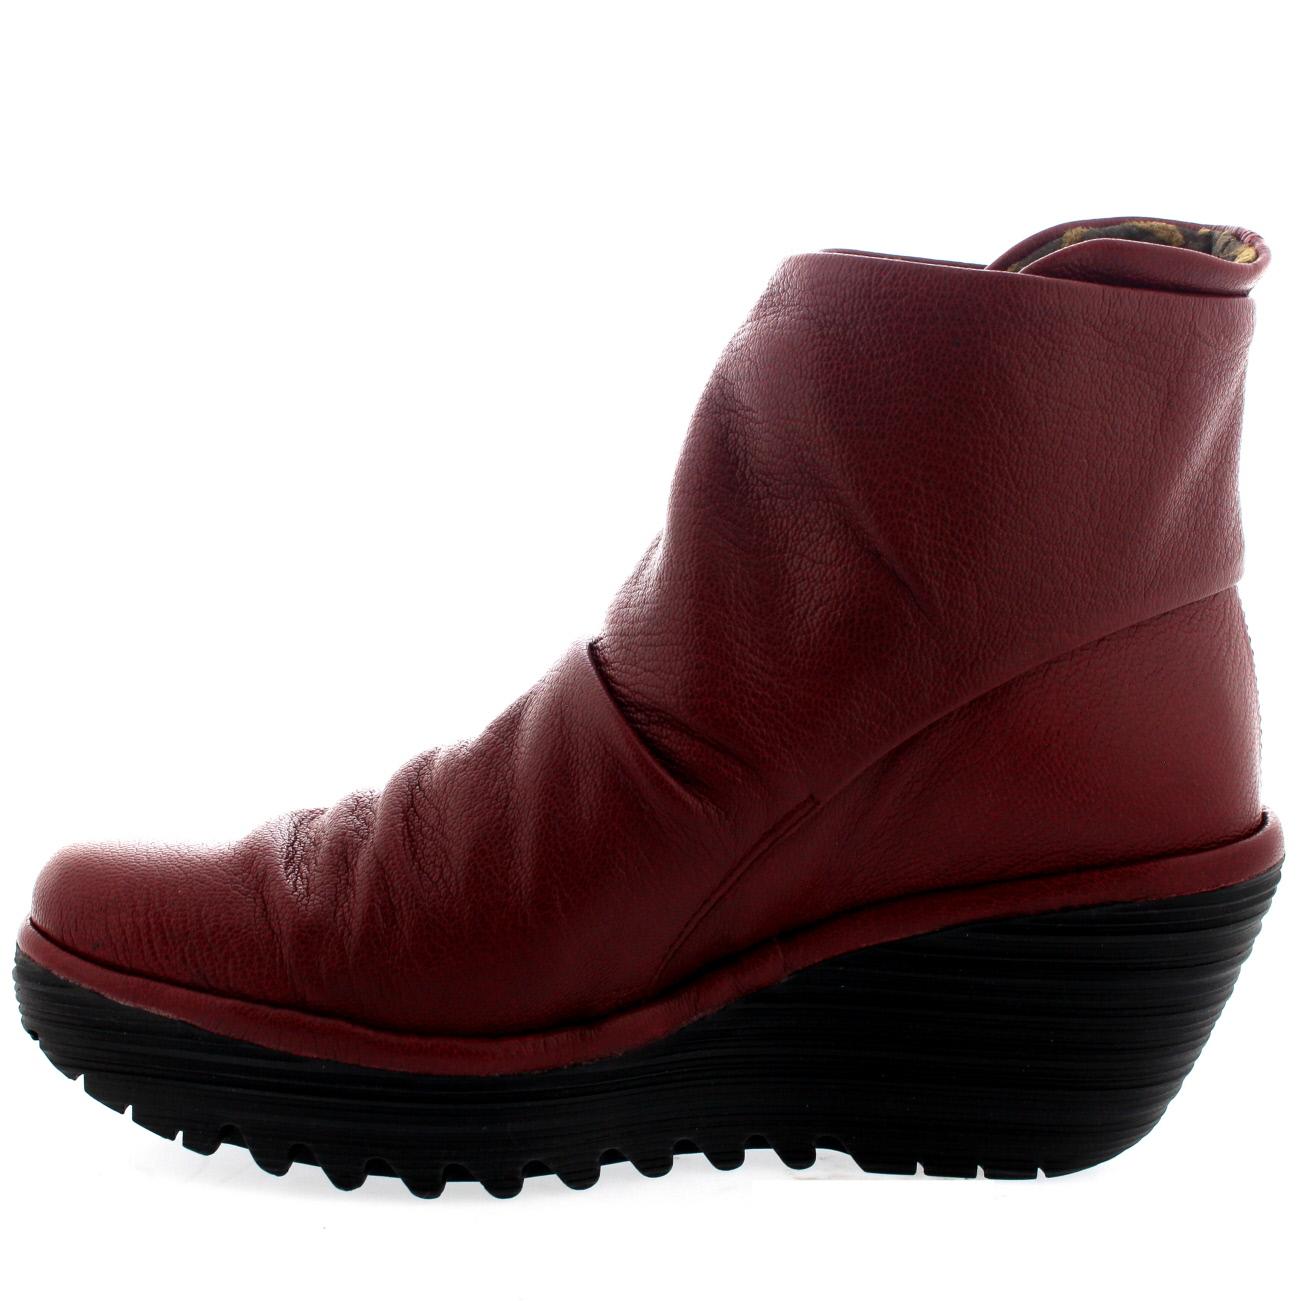 a888e244080 Fly London Yegi Black Leather Womens Wedge Velcro Ankle Boot Shoe UK ...